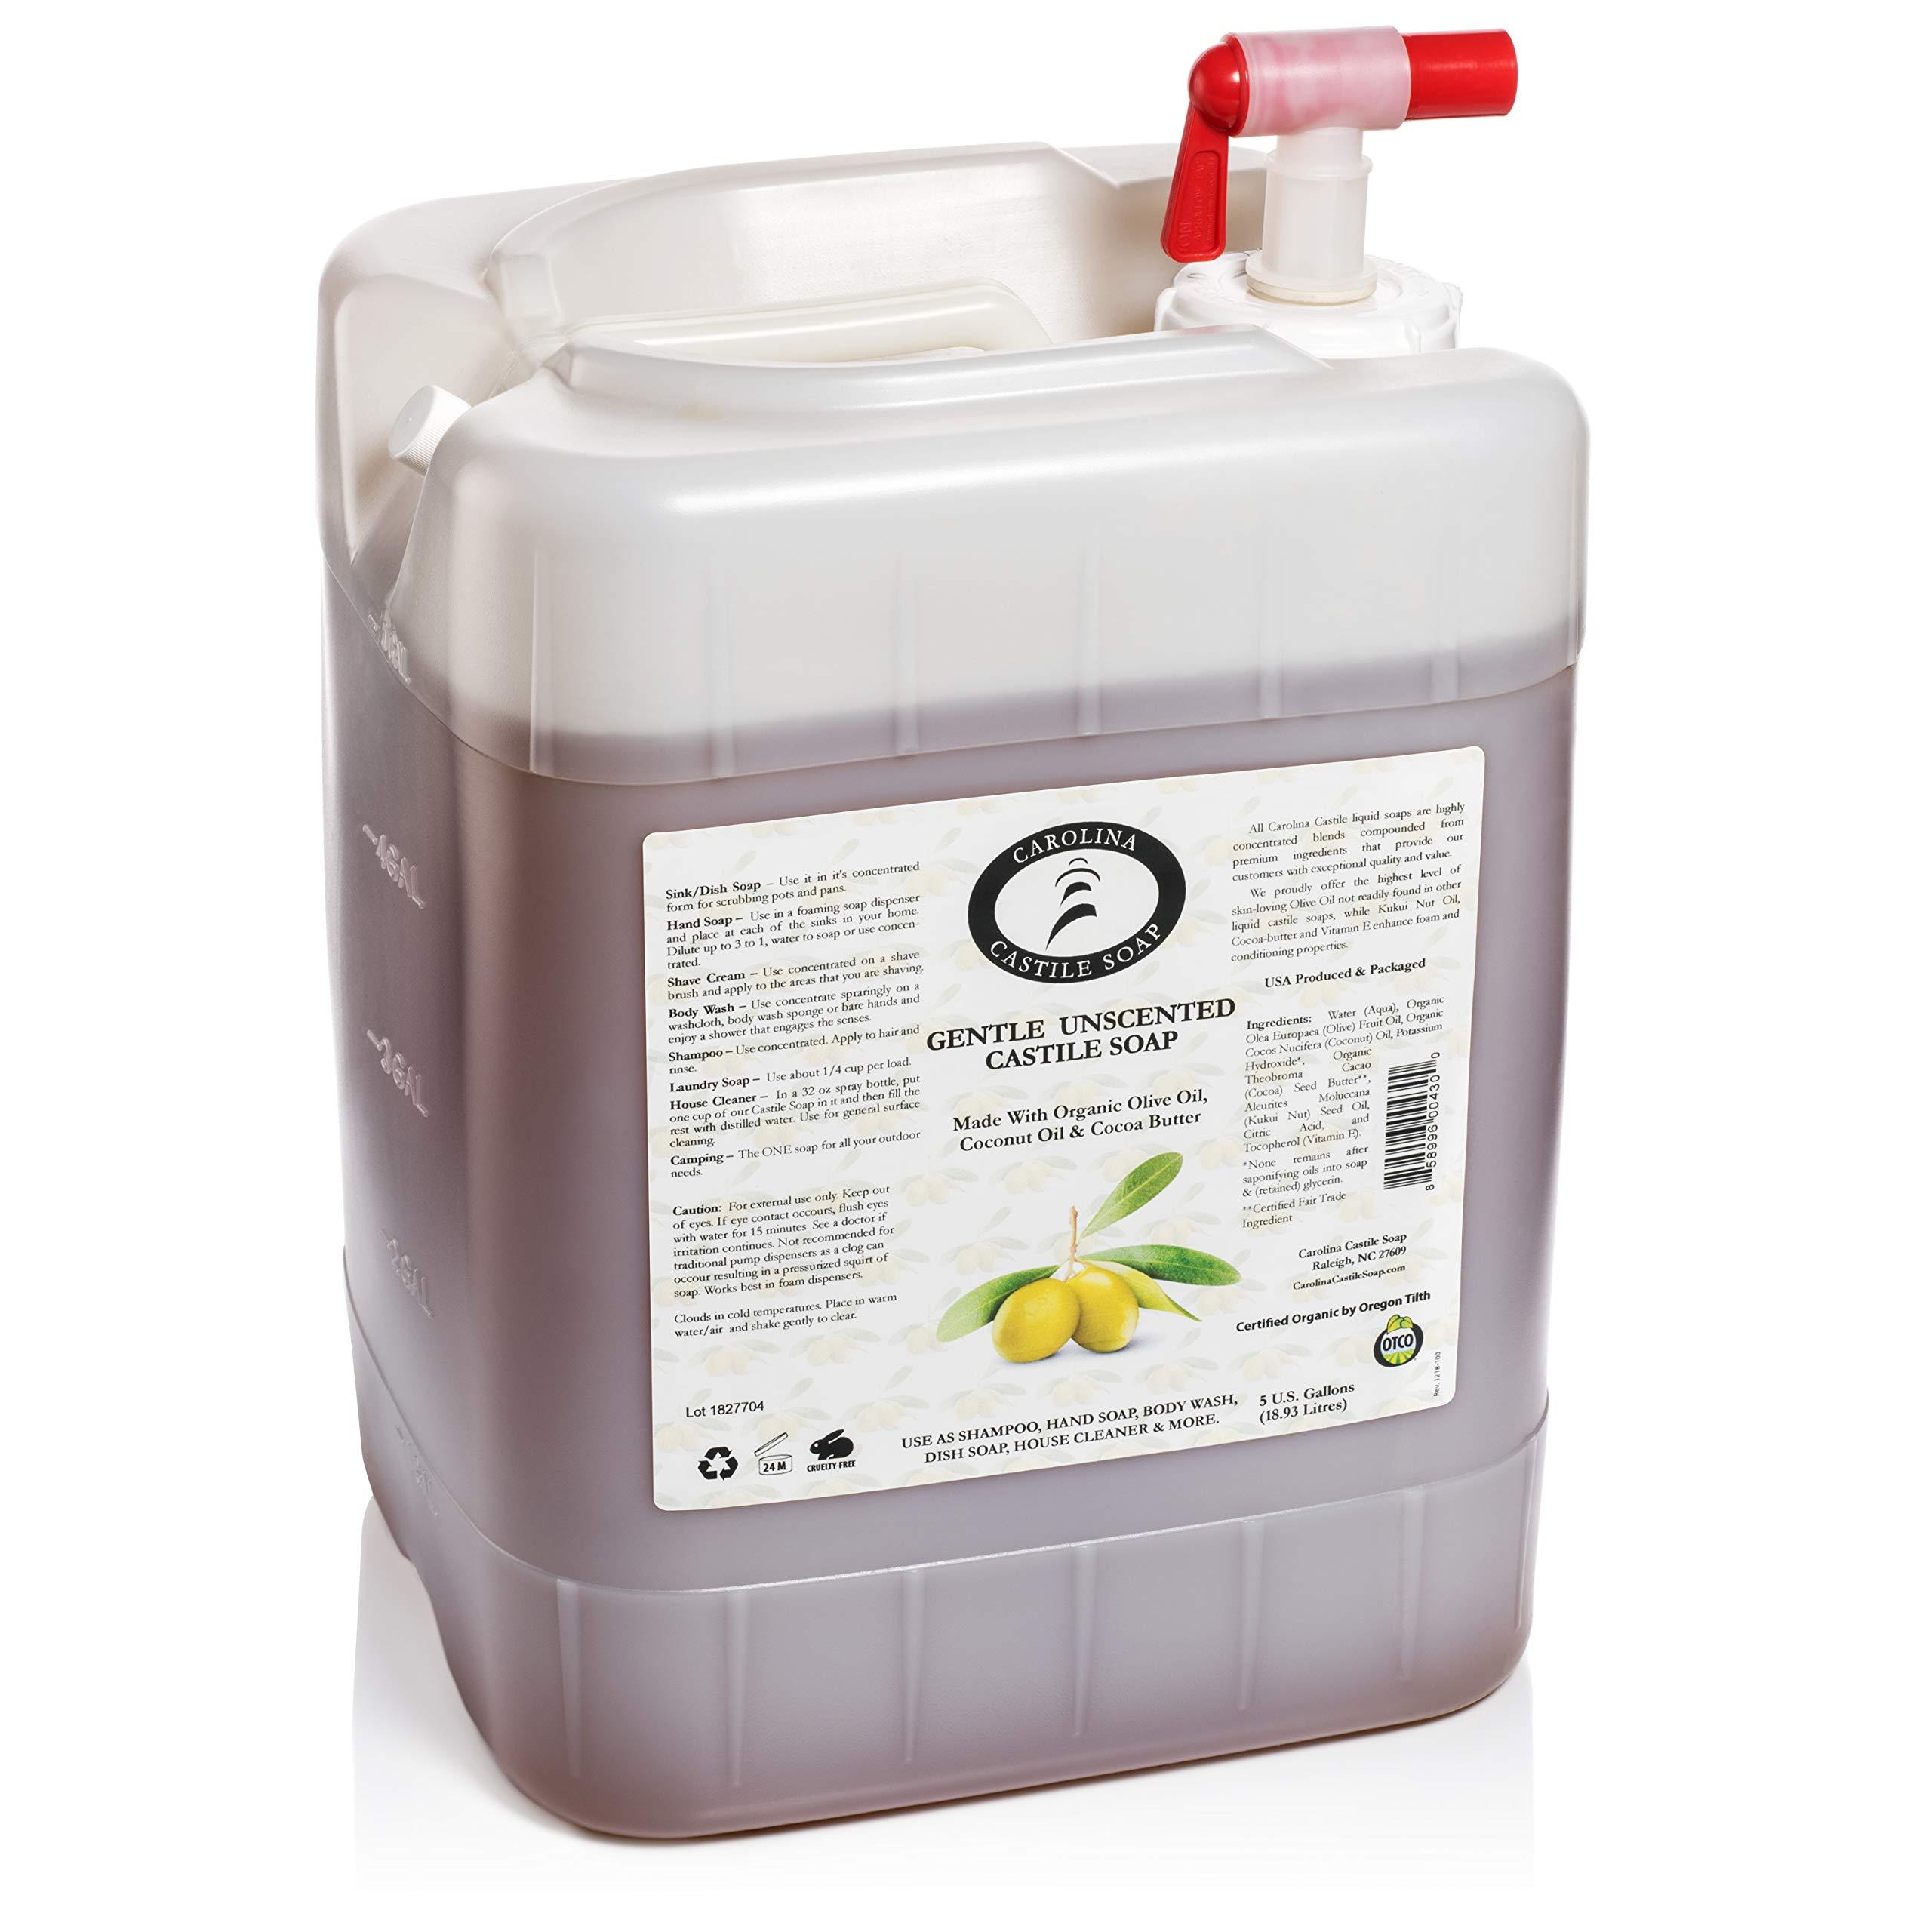 Gentle Unscented Castile Soap 5 Gallon Jug | Certified Organic